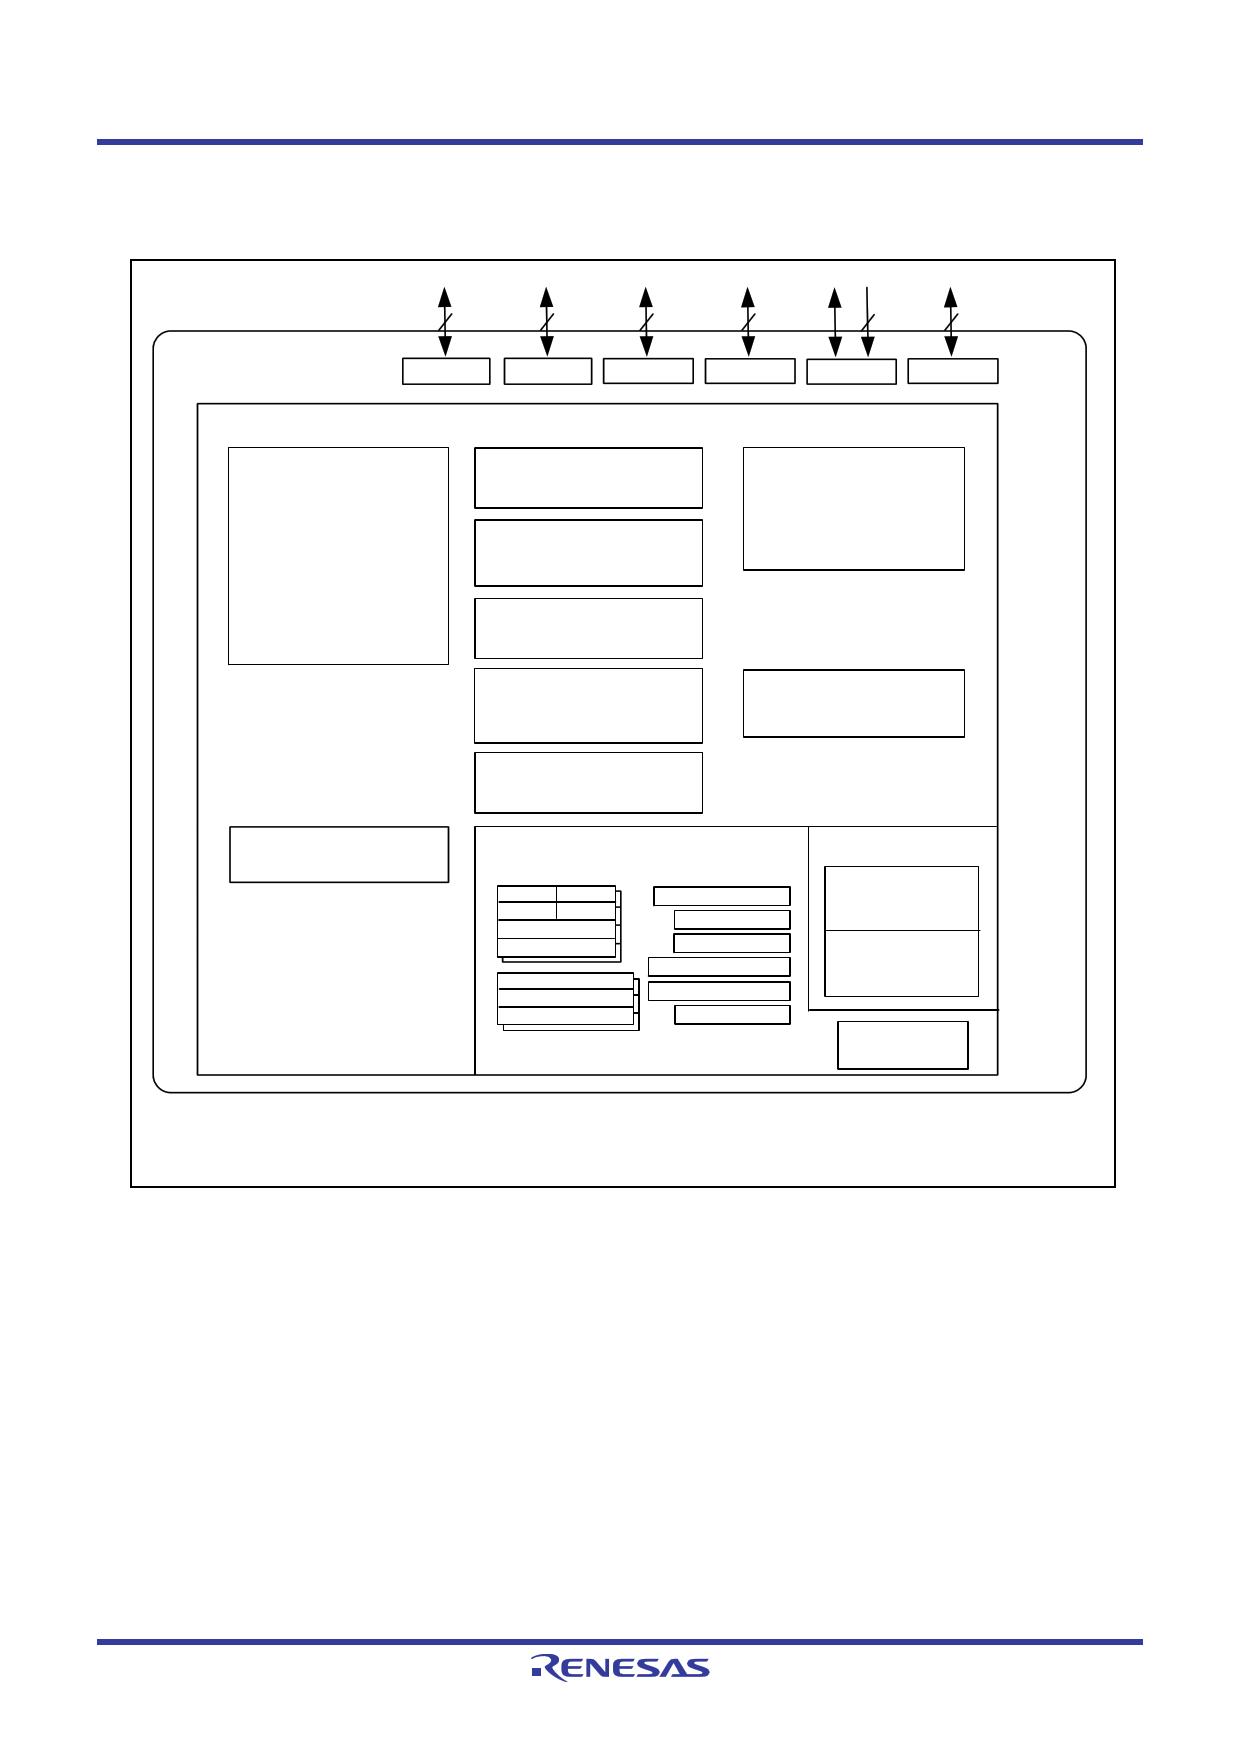 R5F21228DFP pdf, 반도체, 판매, 대치품